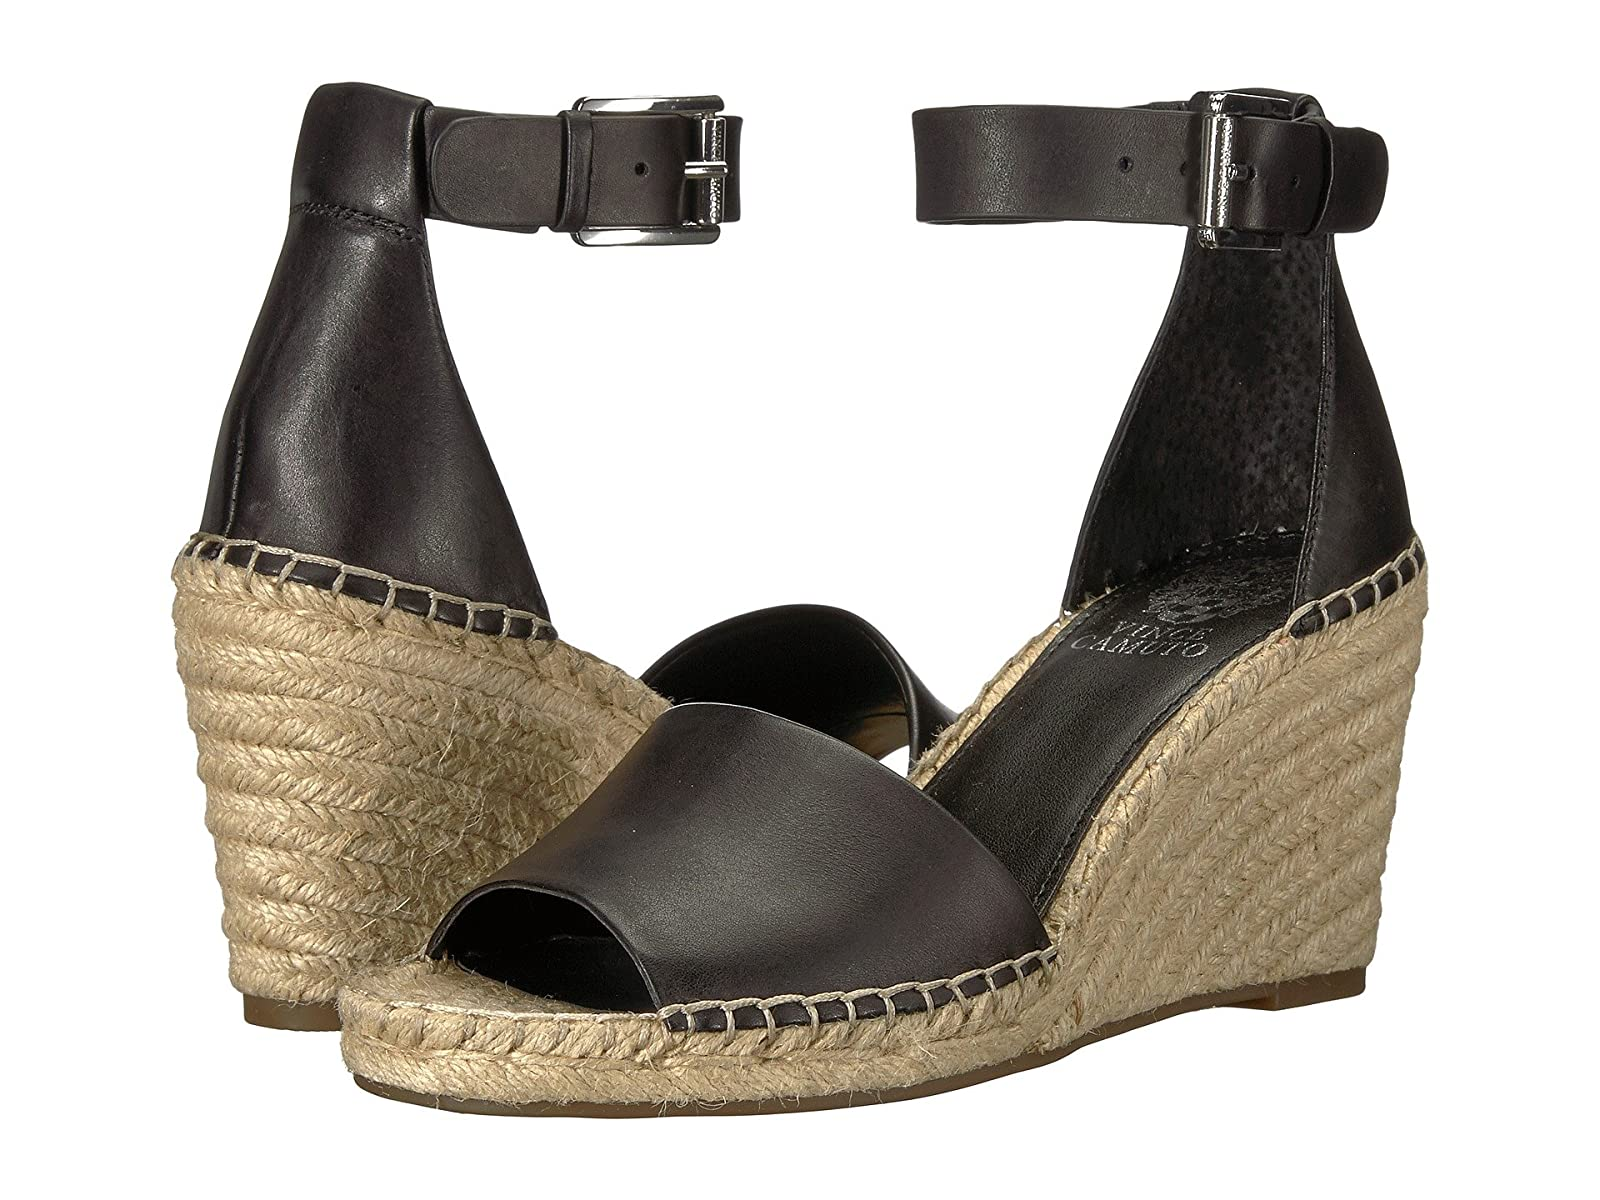 Vince Camuto LeeraAtmospheric grades have affordable shoes